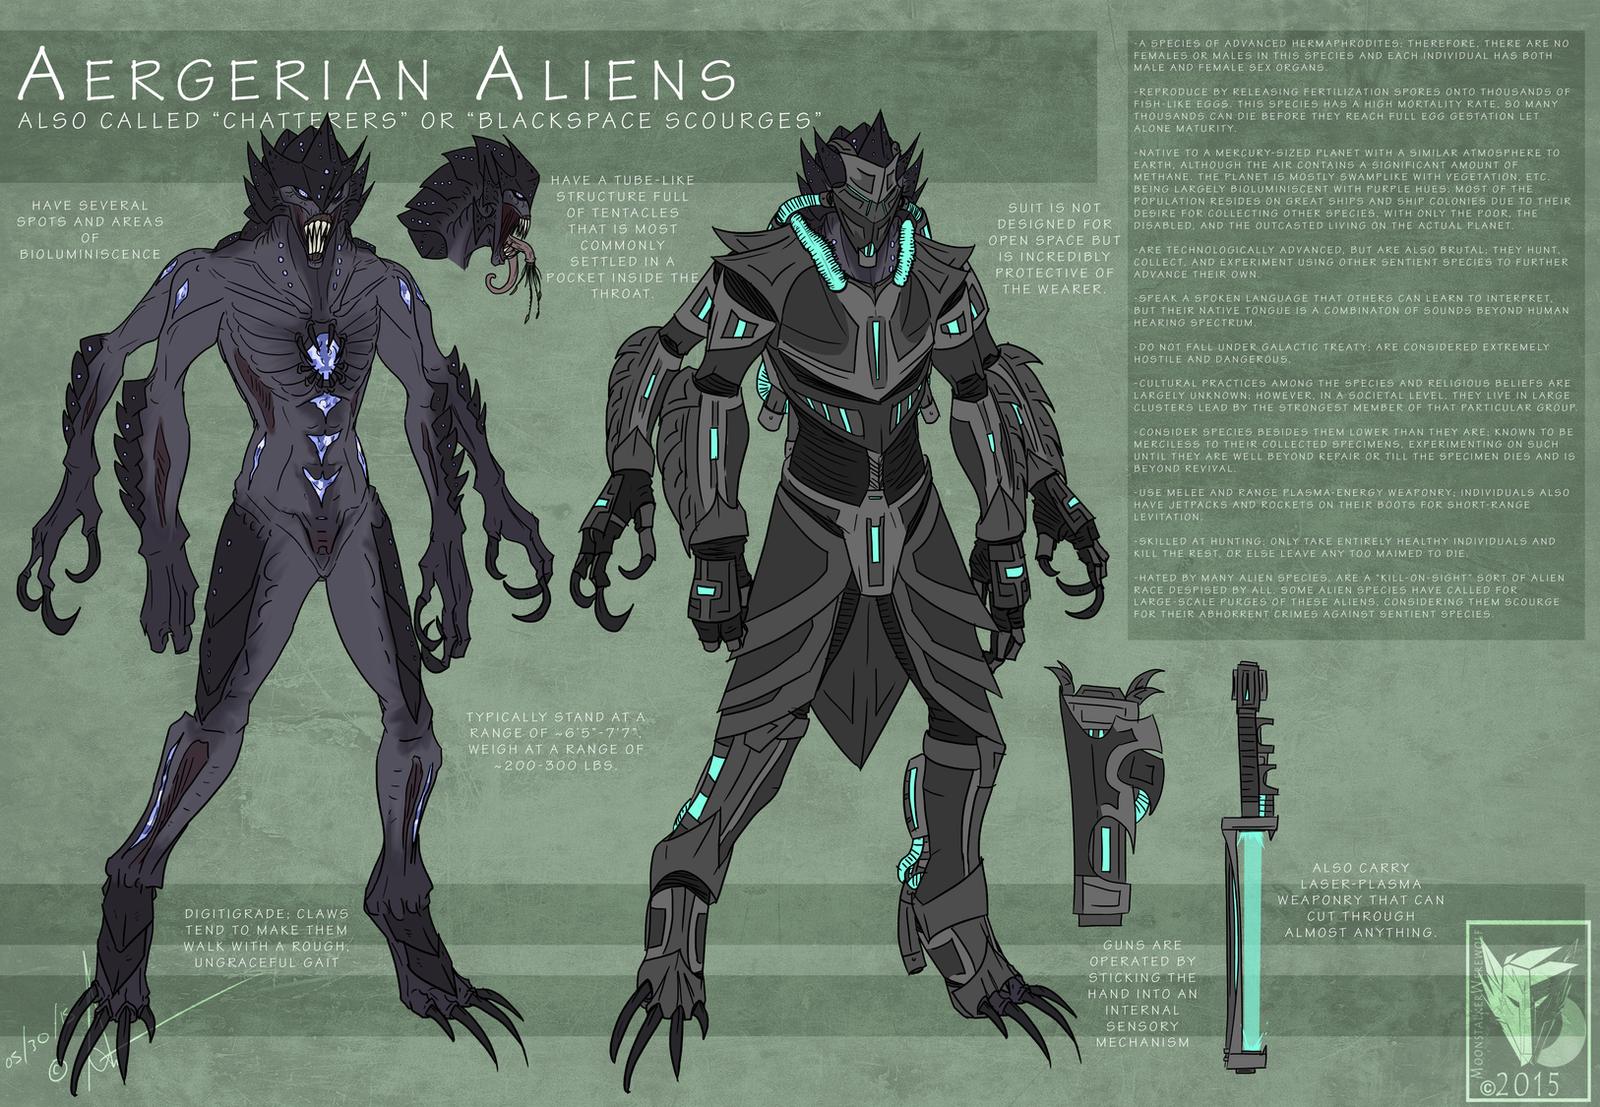 book of alien races pdf